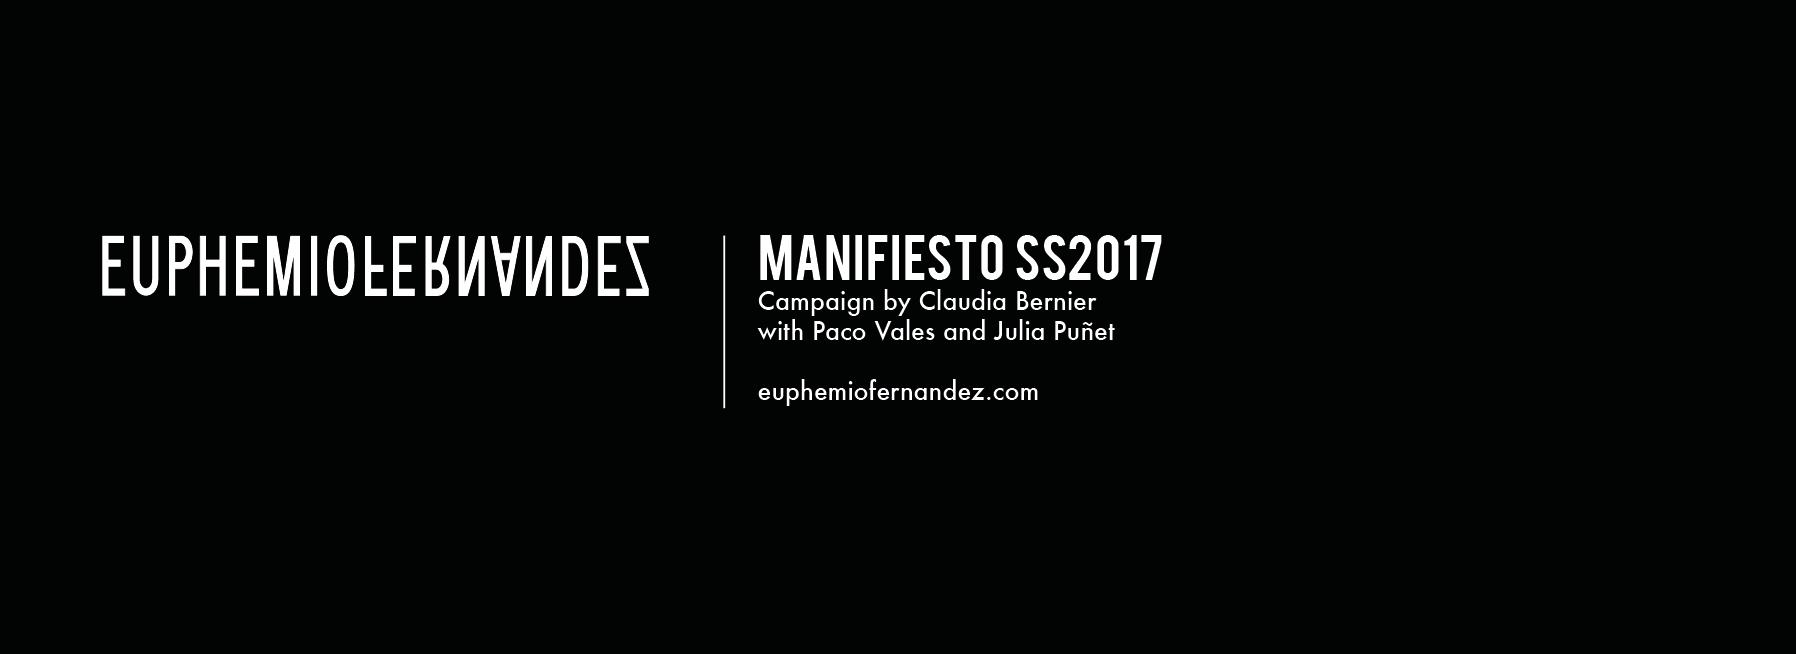 manifiesto euphemio fernandez campaign claudia bernier ss2017